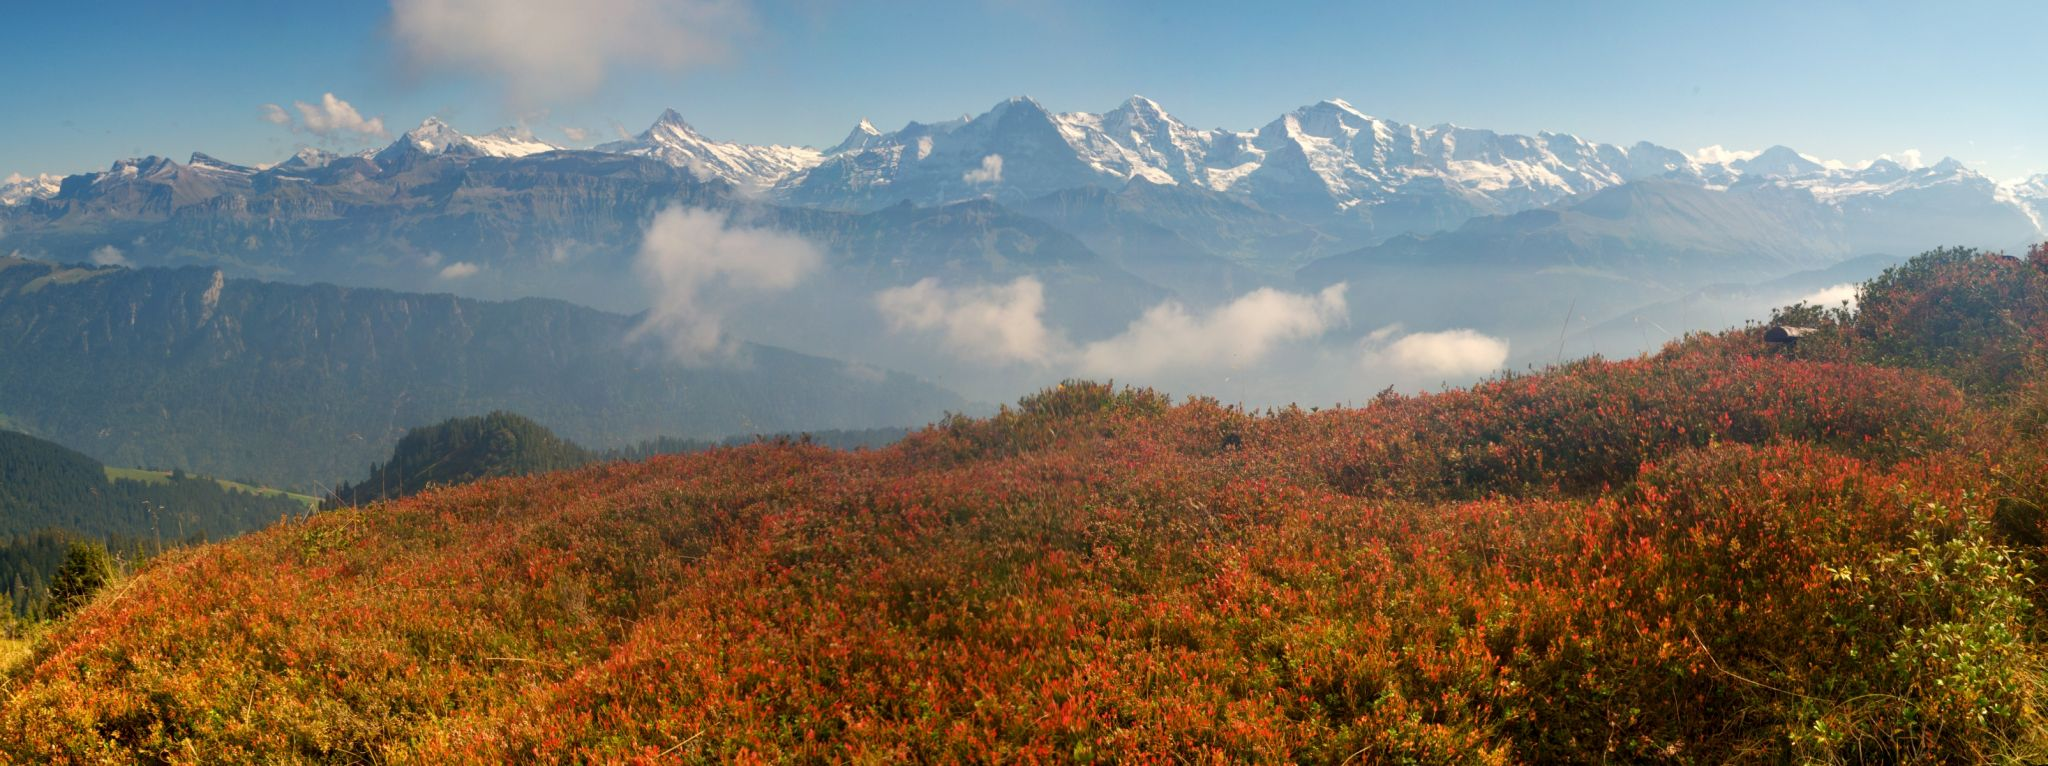 The 3 big mountains seen from Güggisgrat, Switzerland